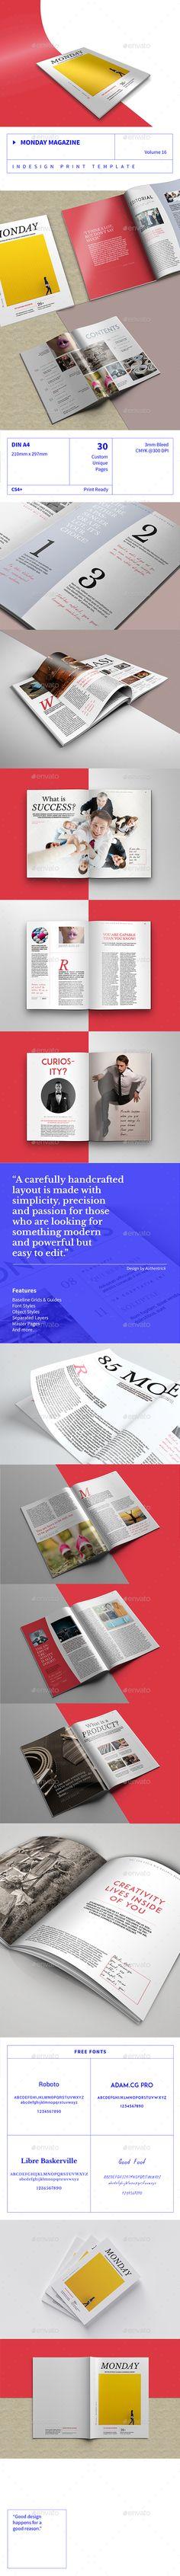 Monday Magazine - Volume 16 - Magazines Print Templates Download here : https://graphicriver.net/item/monday-magazine-volume-16/19591895?s_rank=33&ref=Al-fatih